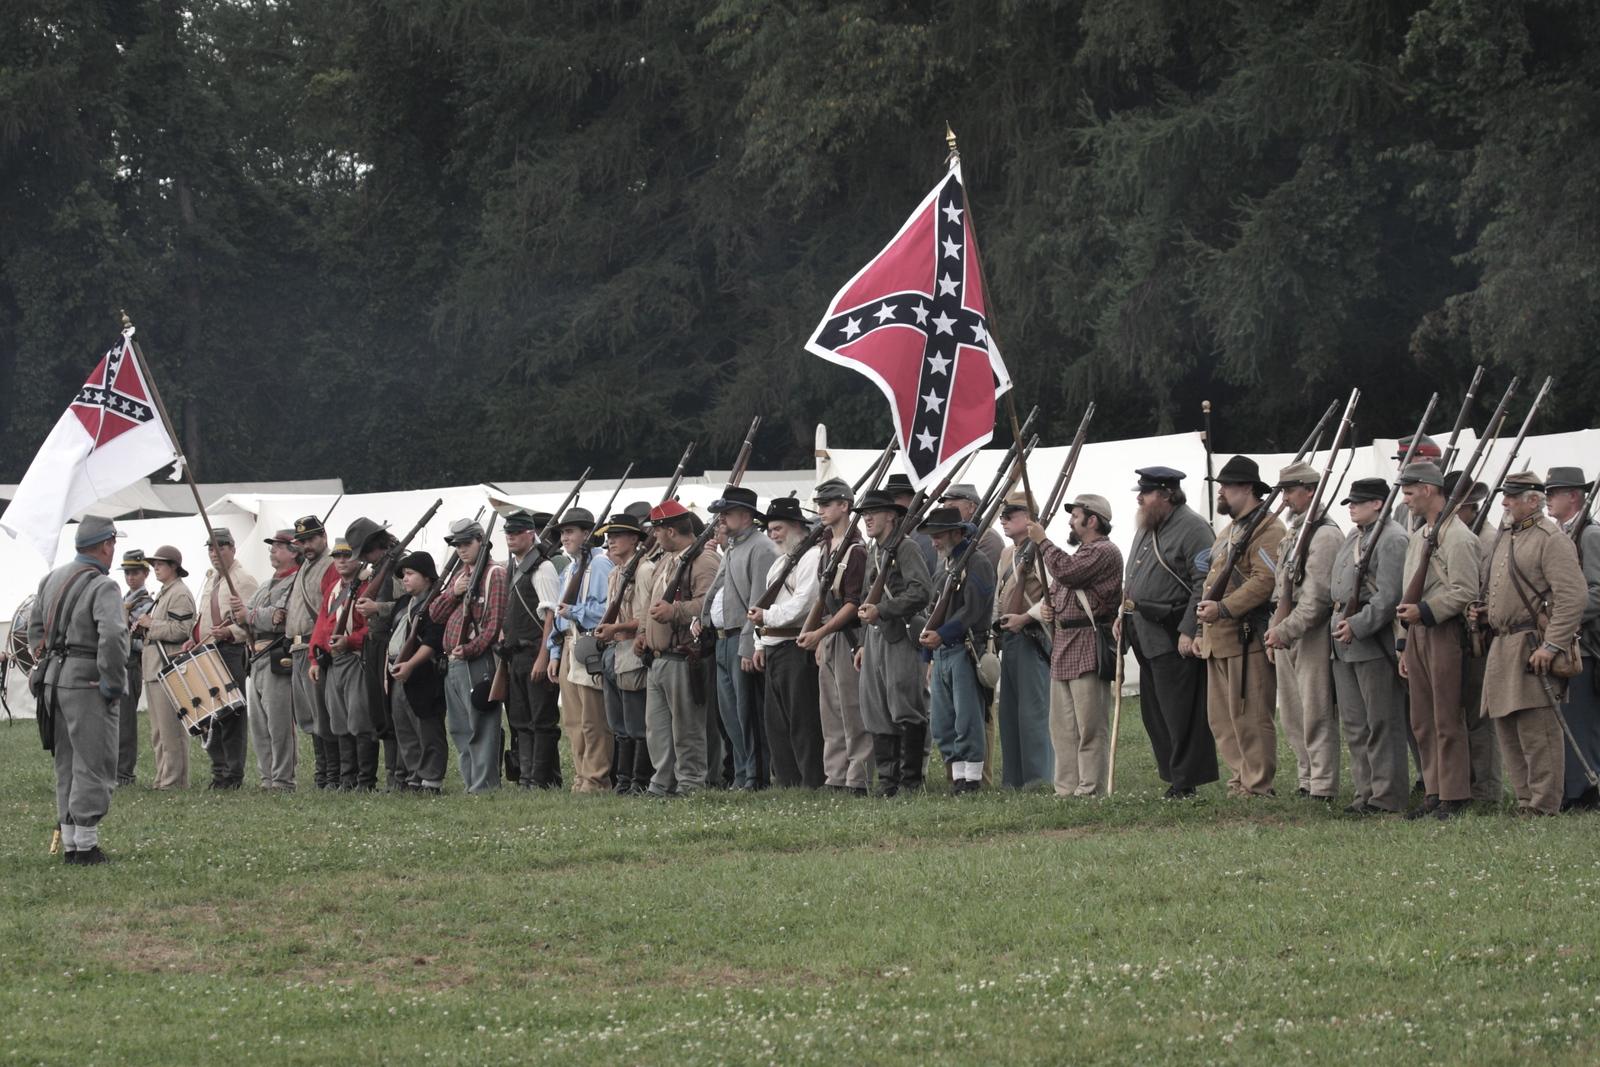 Confederate Soldiers - US Civil War